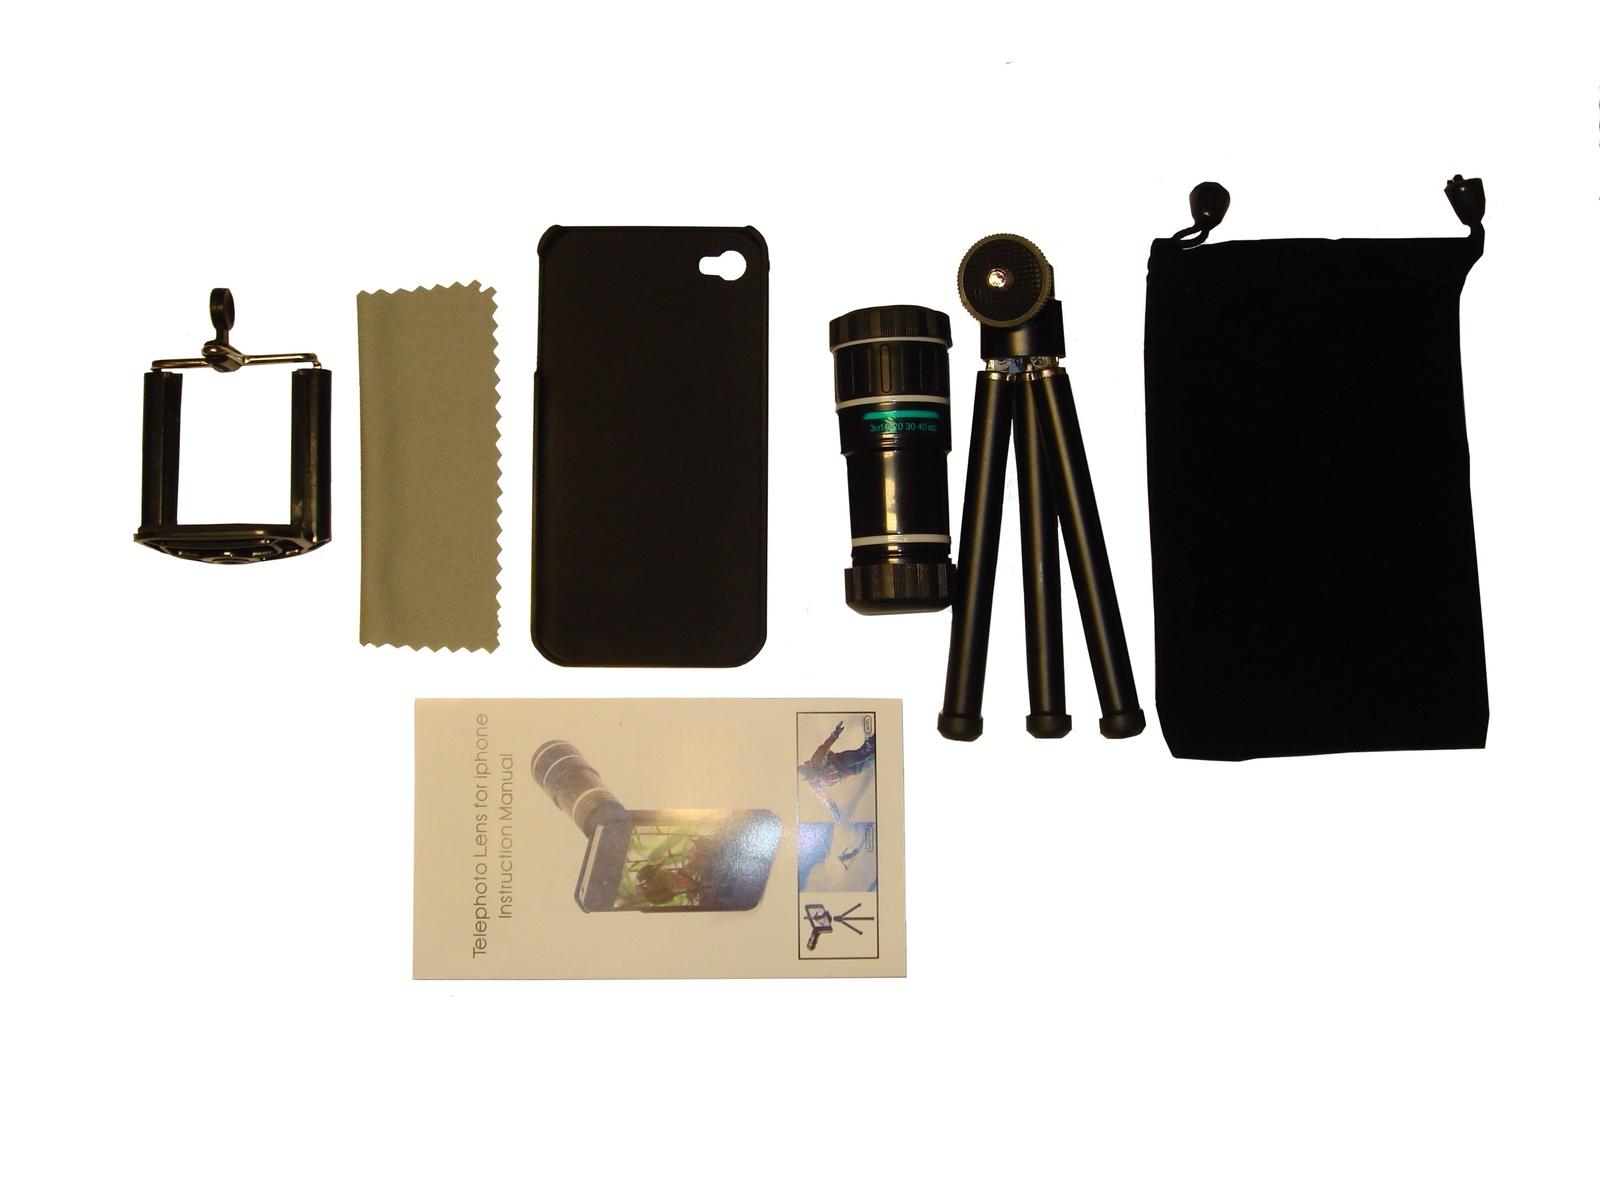 Теле зум объектив GZ FULIDER Commodity CO., LTD Zoom telephoto батарея для мобильных телефонов utop hk 10 iphone 3gs page 2